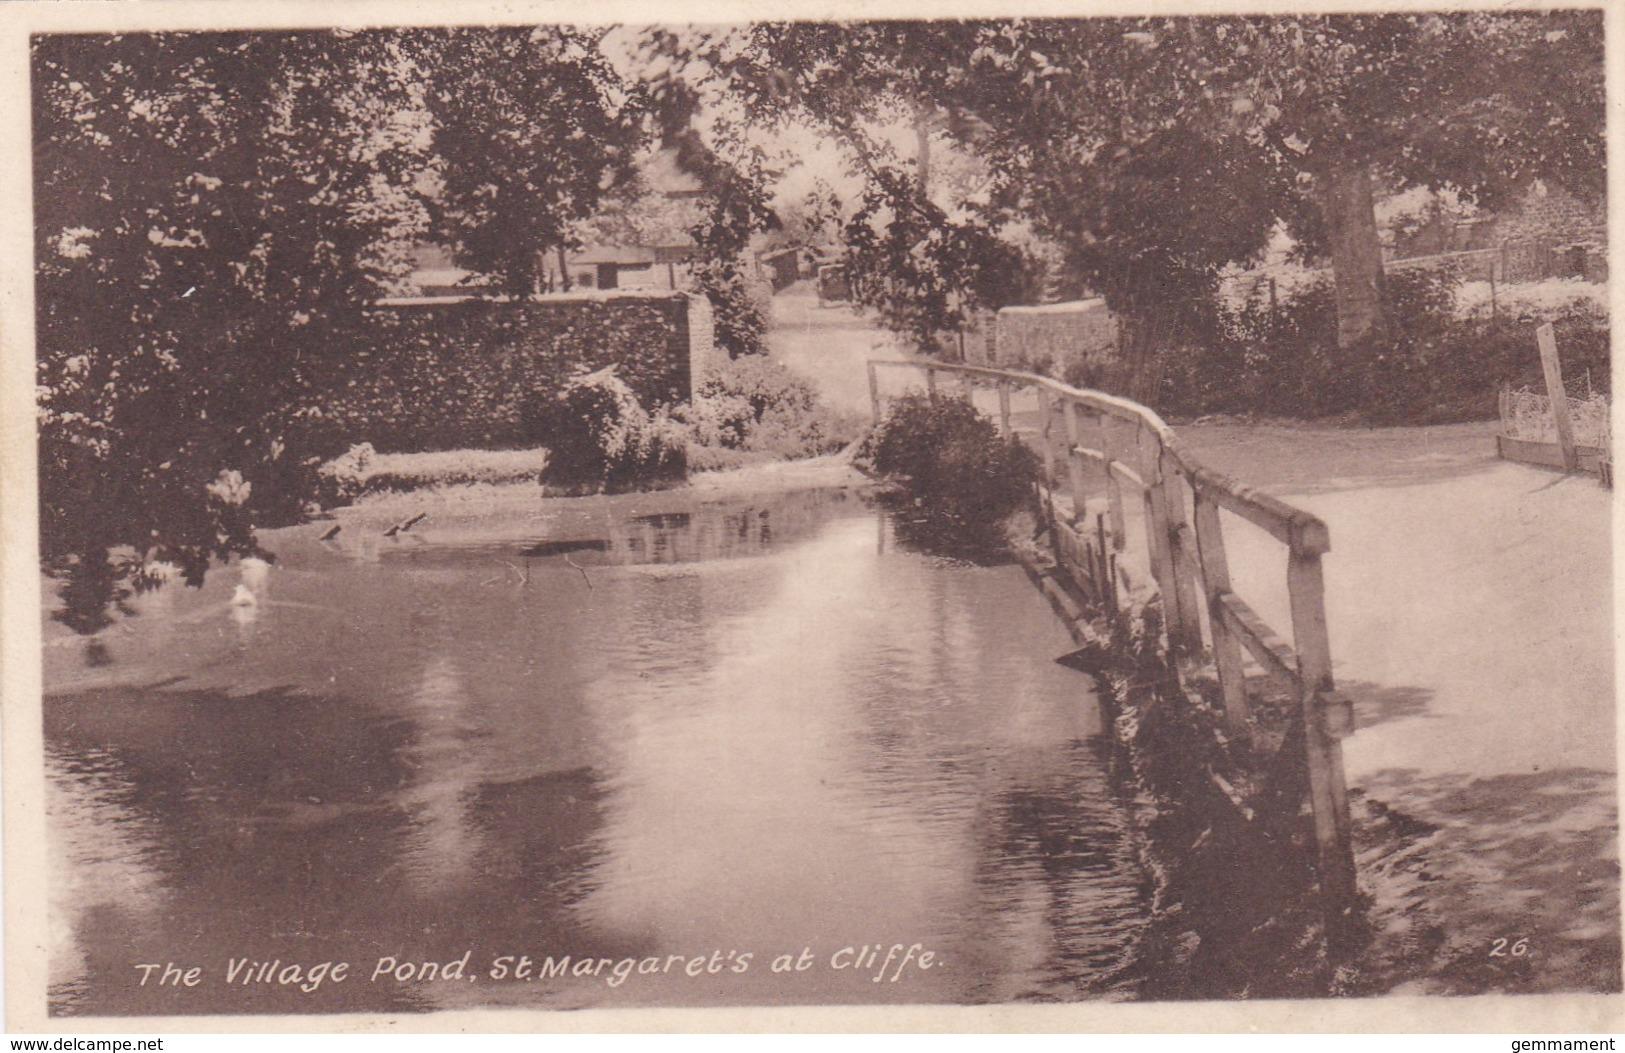 ST MARGARET'S AT CLIFFE - THE VILLAGE POND - England